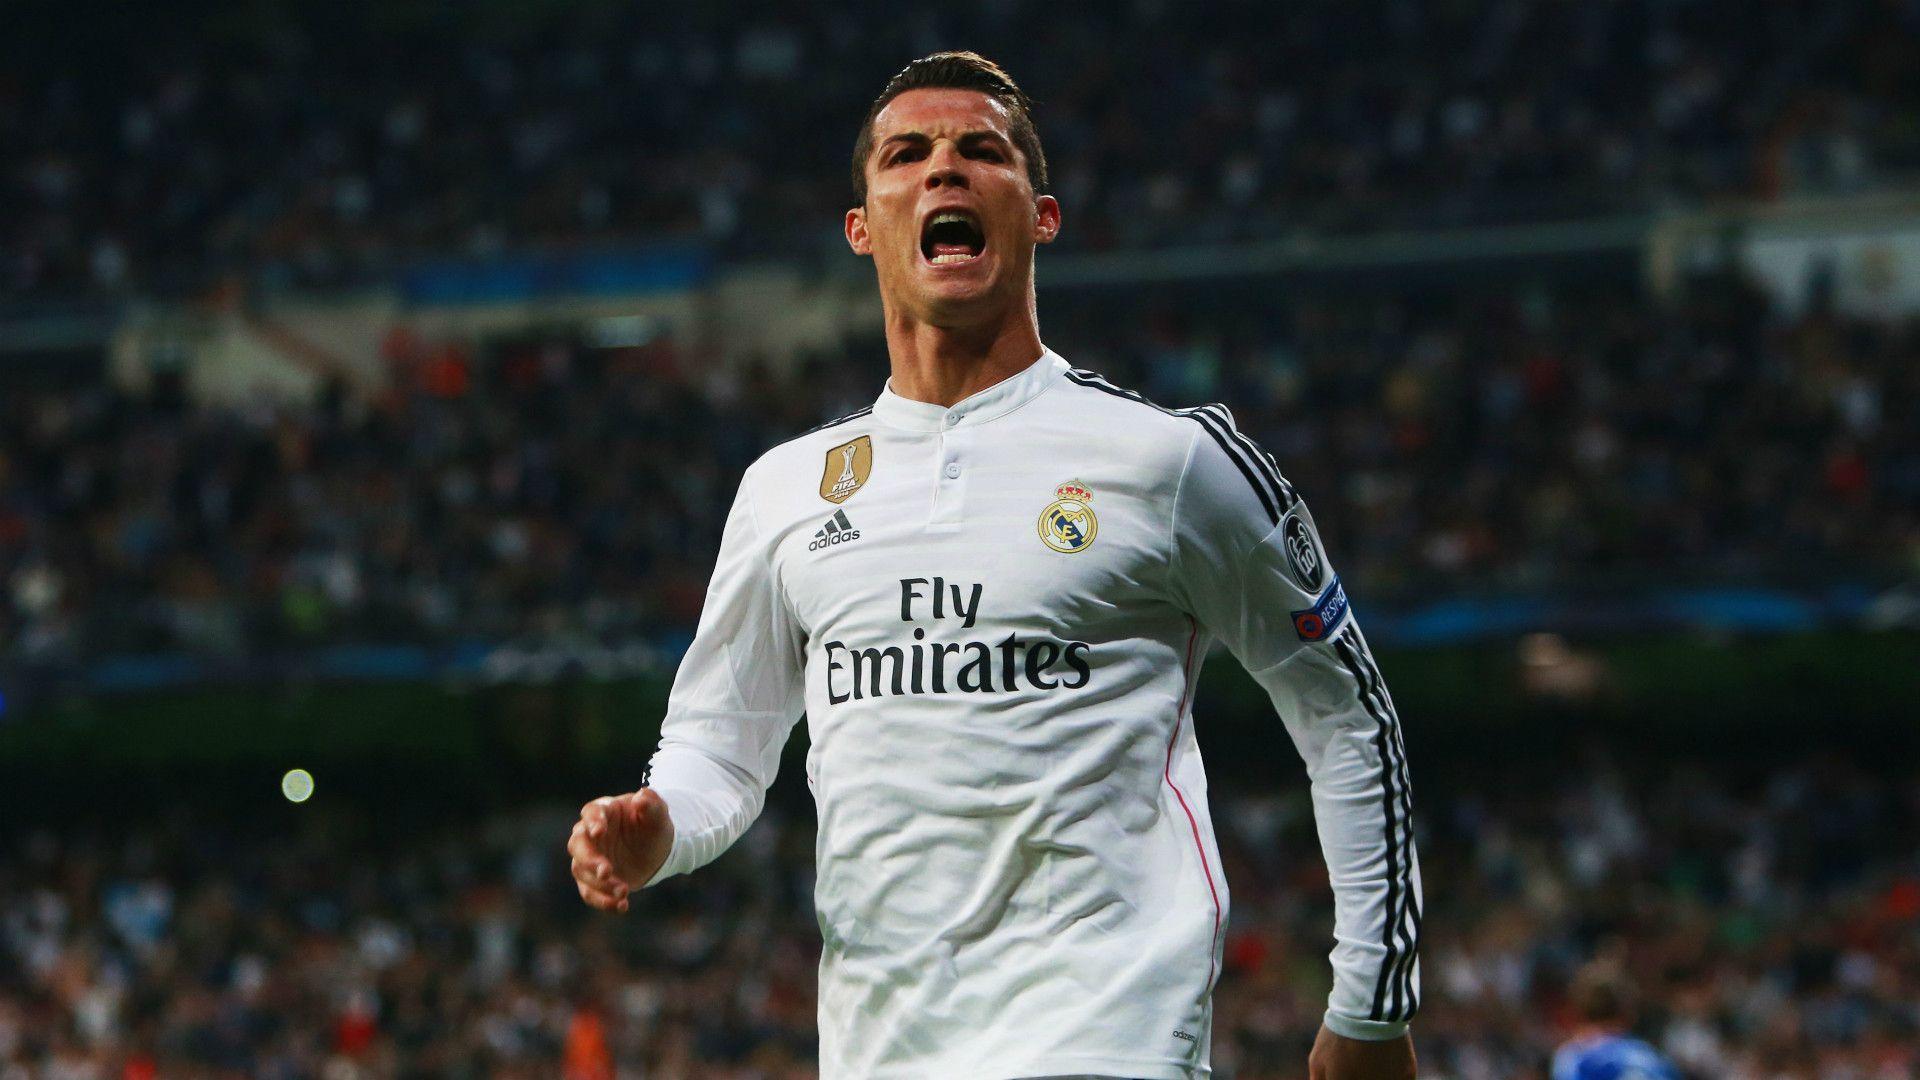 Cristiano Ronaldo Real Madrid 2018 Wallpapers Wallpaper Cave